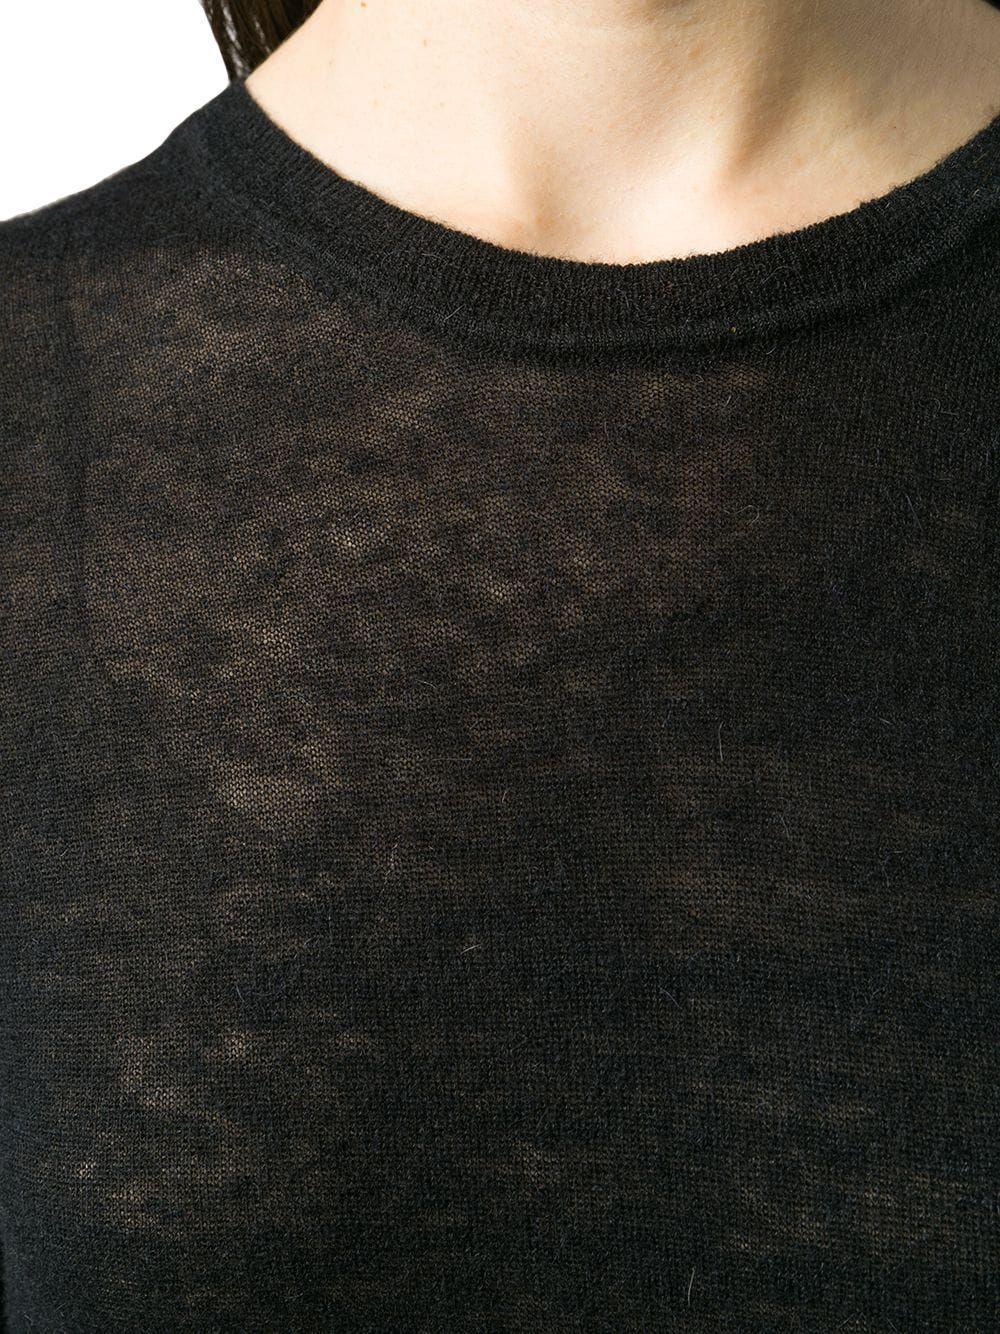 ISABEL MARANT ÉTOILE WOMEN'S PU103519A051E01BK BLACK POLYAMIDE SWEATER